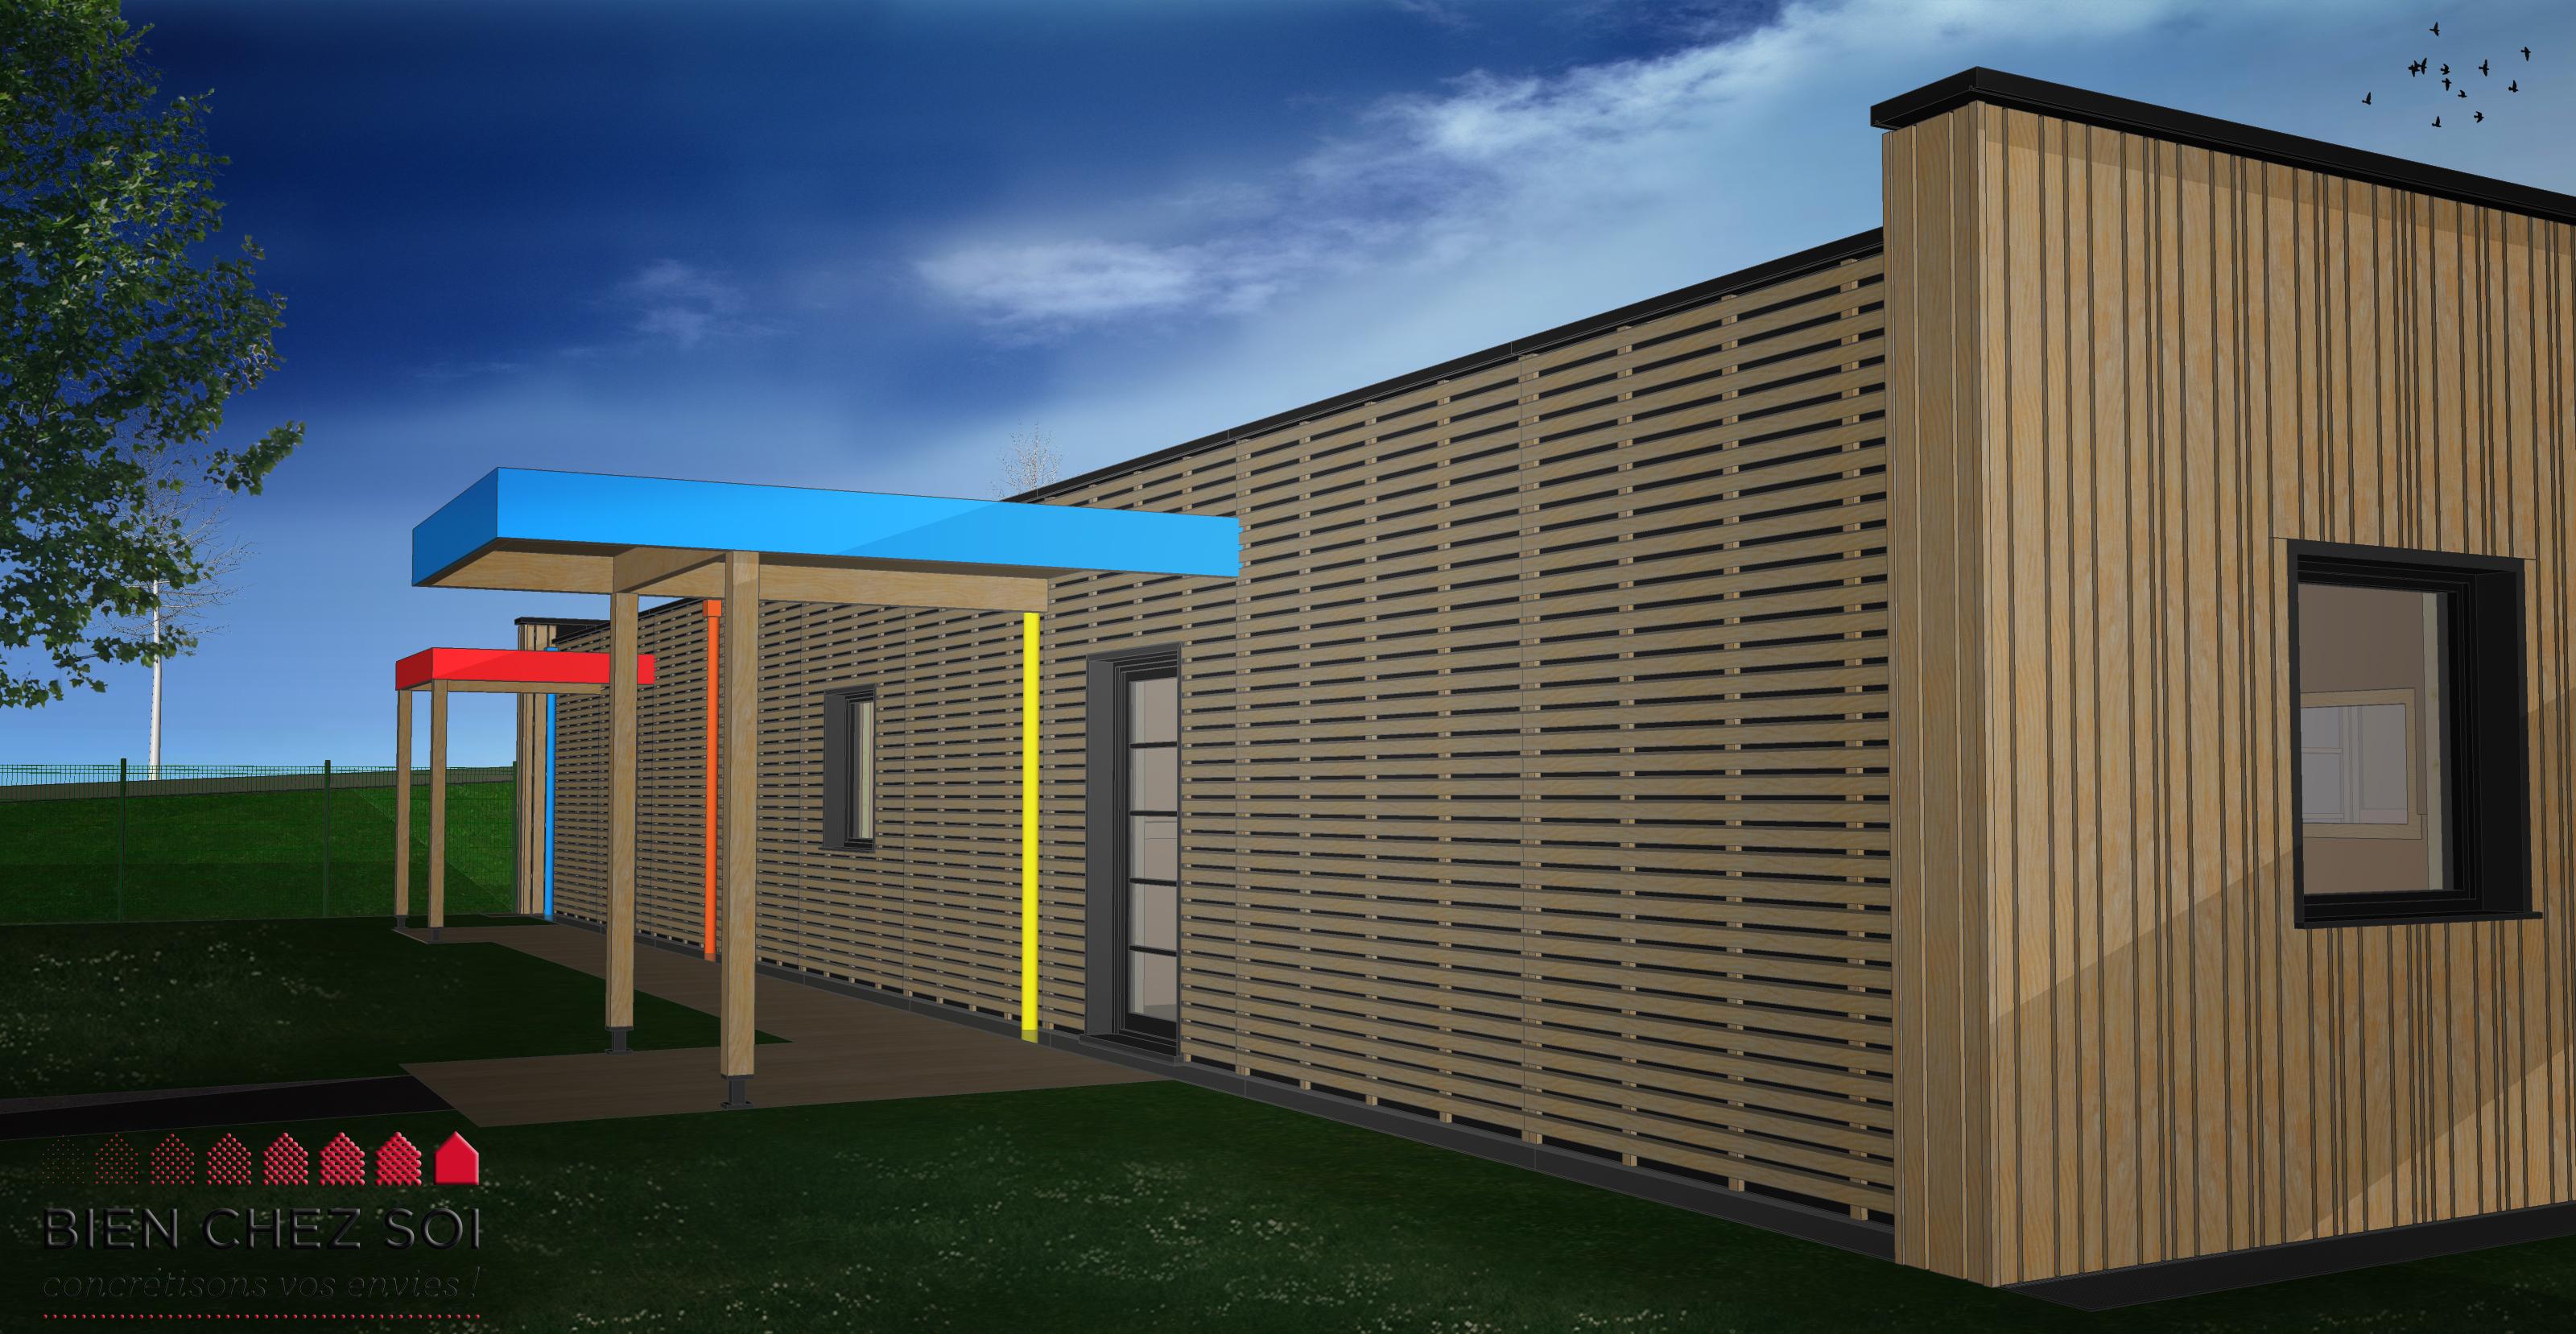 Lille-architecte-Montage-CRECHE-L